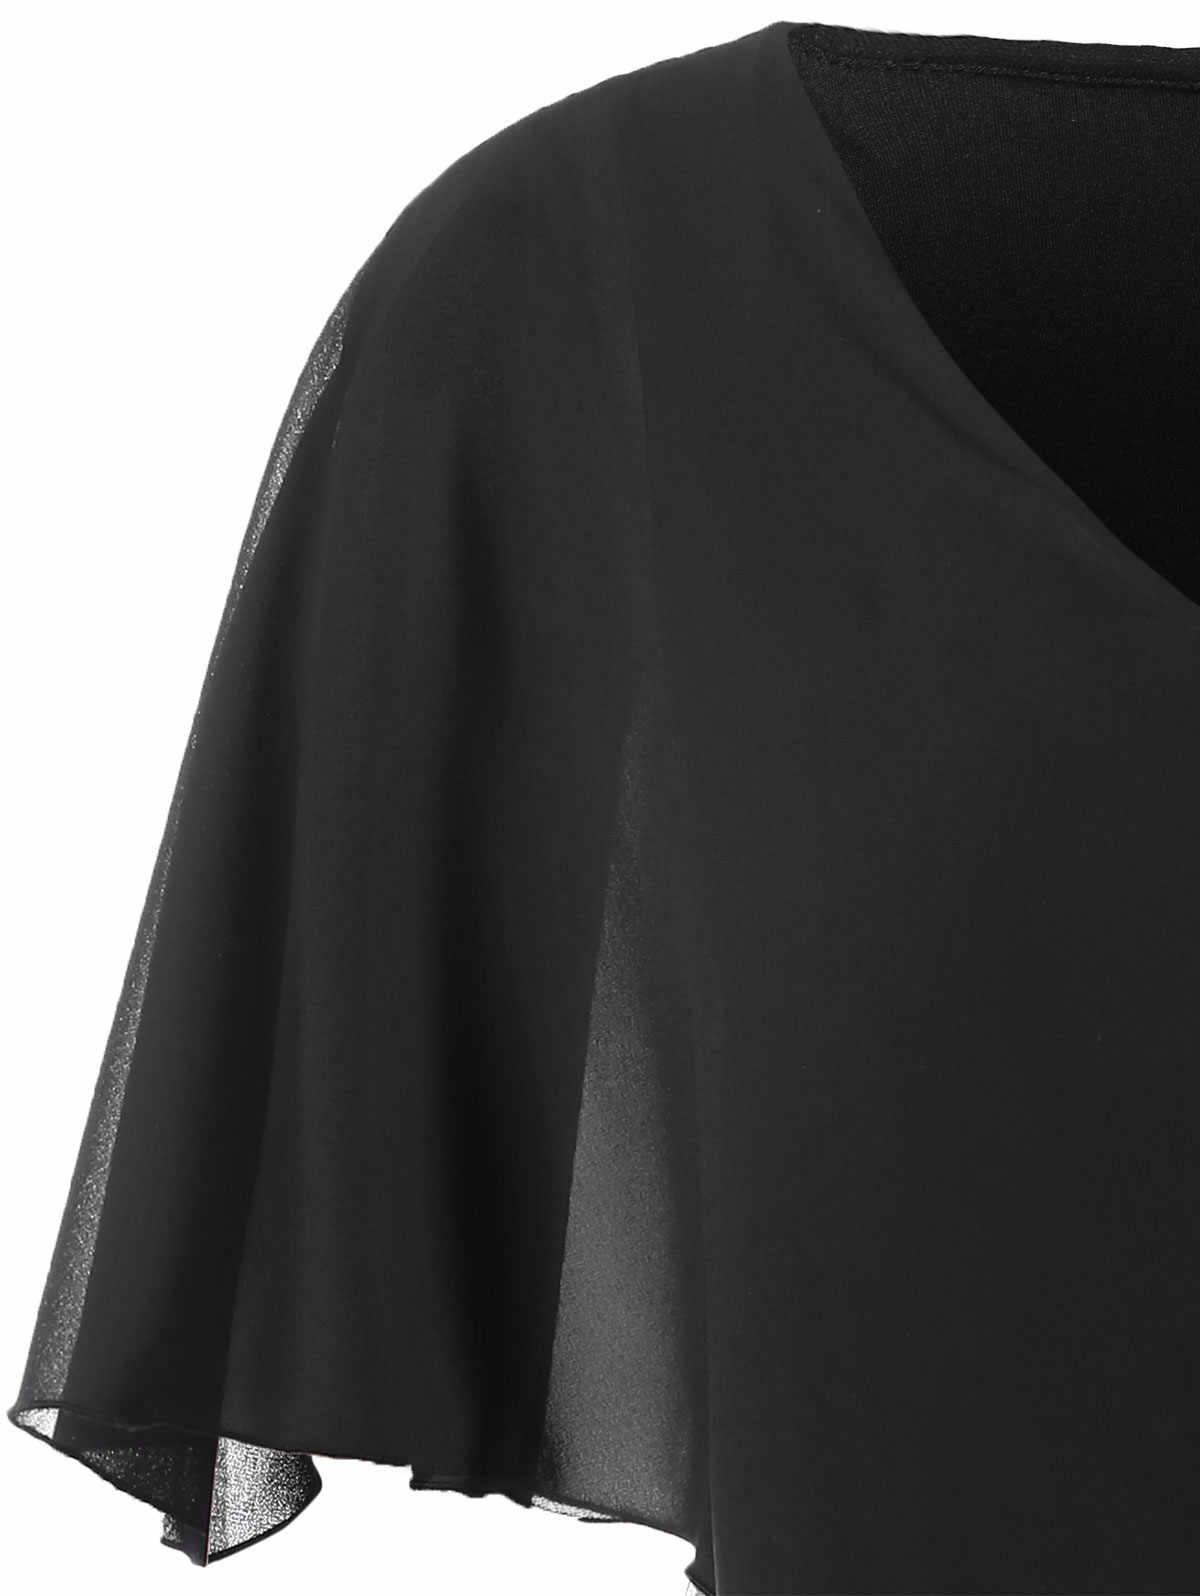 04653f9b74413 ... Wipalo Plus Size Chiffon Overlay Sequin Capelet Dress Women Bodycon  Dress V-Neck Party Dresses